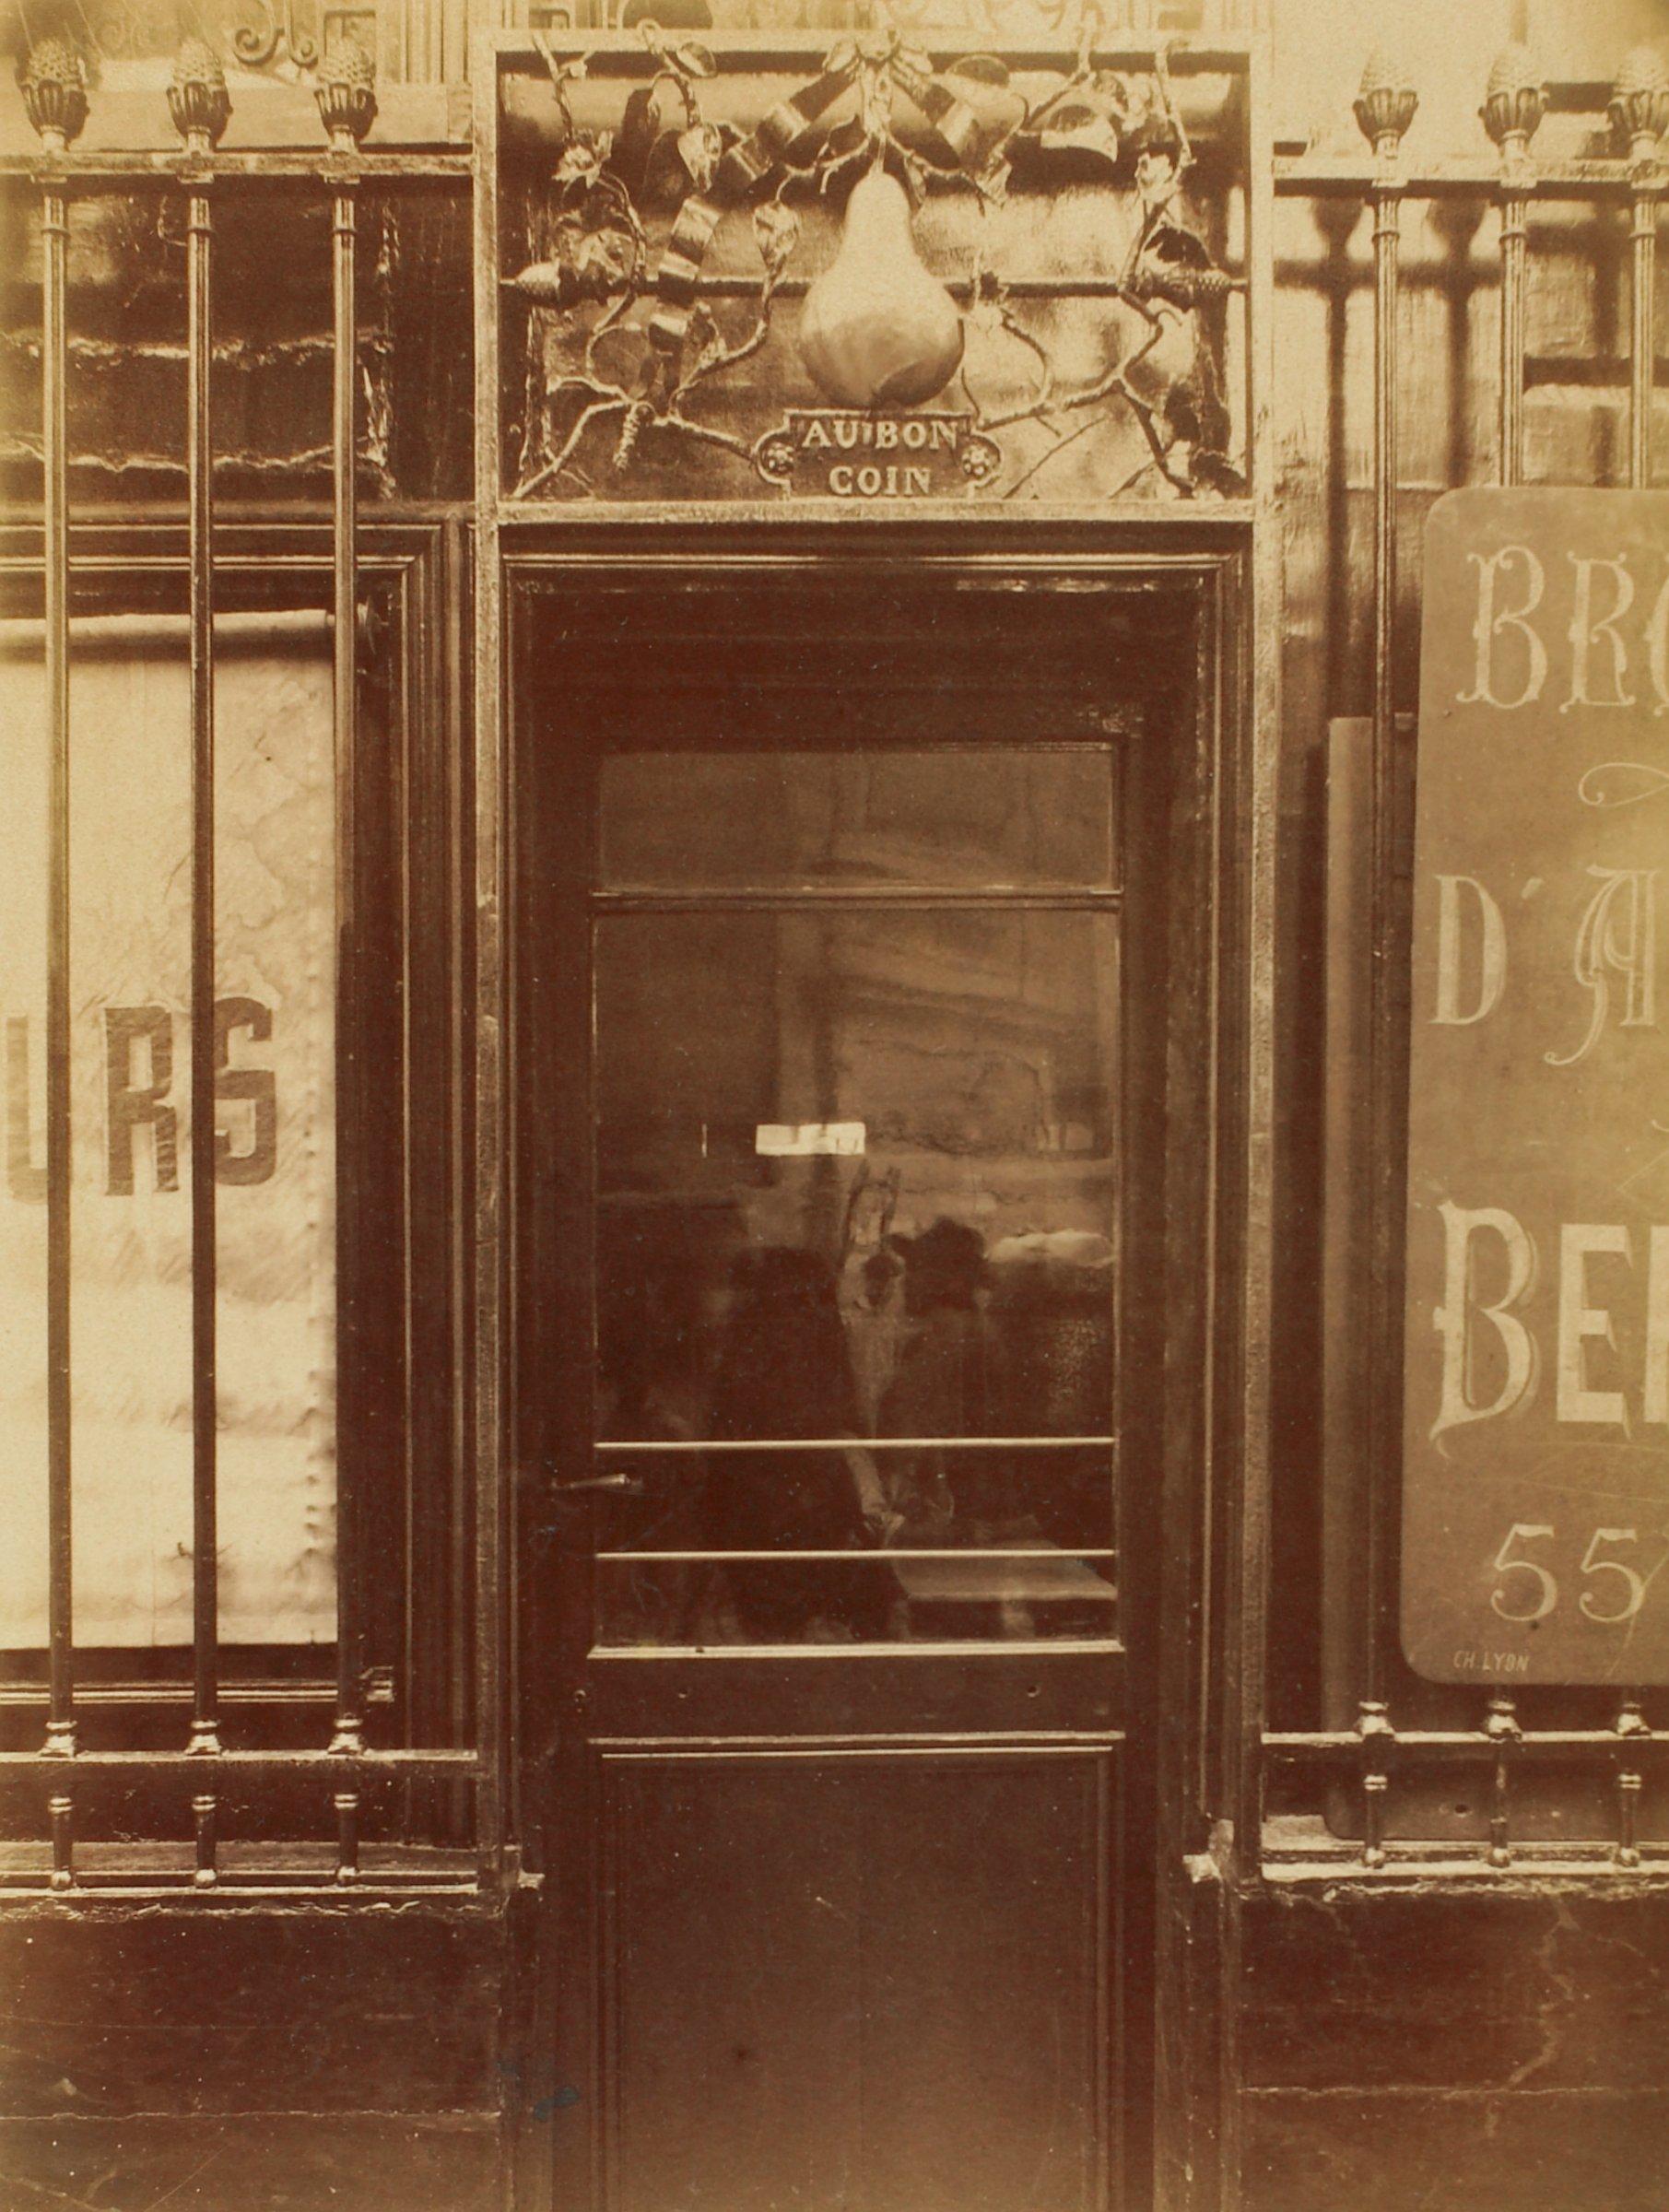 Au Bon Coin, rue des Haudriettes, Eugène Atget, gelatin silver print